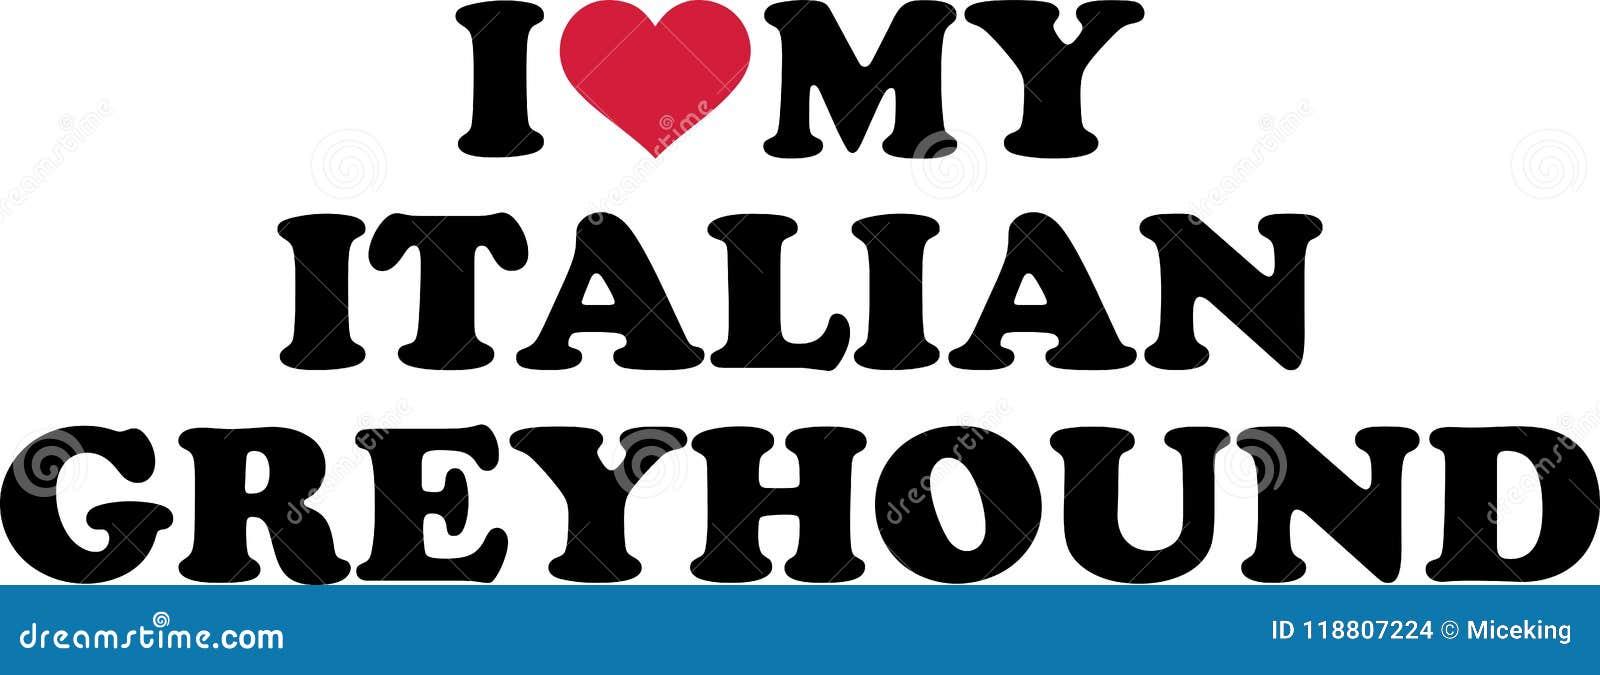 I Love My Italian Greyhound Stock Vector Illustration Of Canine